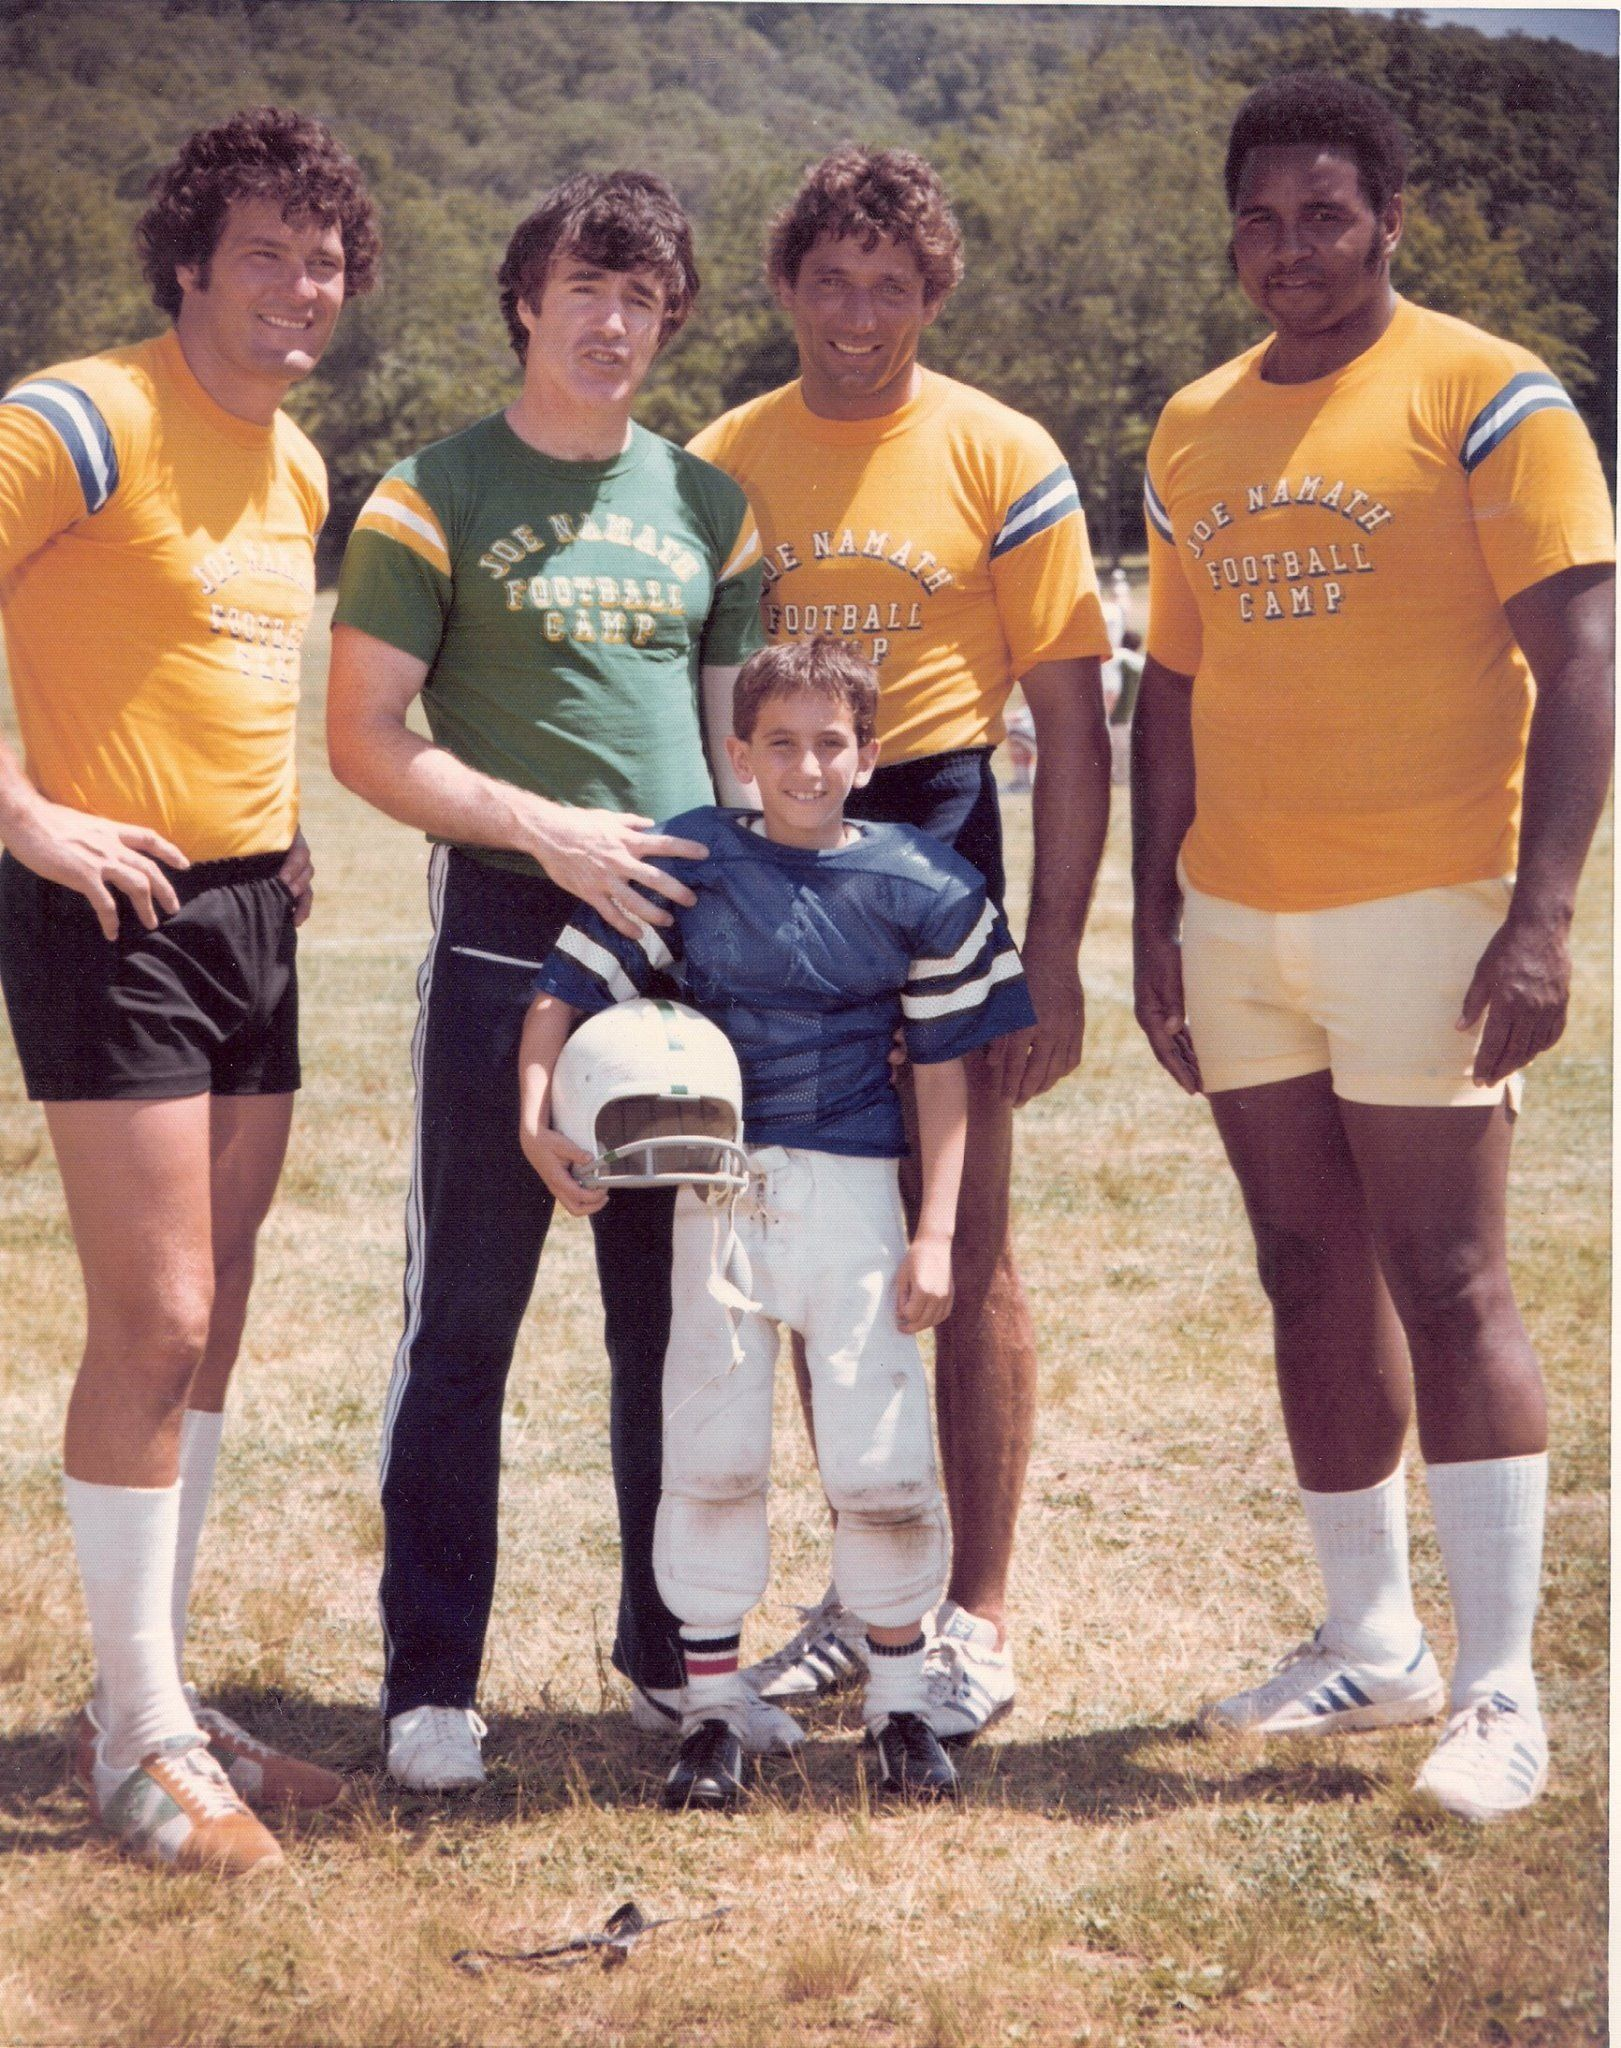 Joe, John Dockery, Winston Hill at Camp! | Joe Namath | Pinterest ...